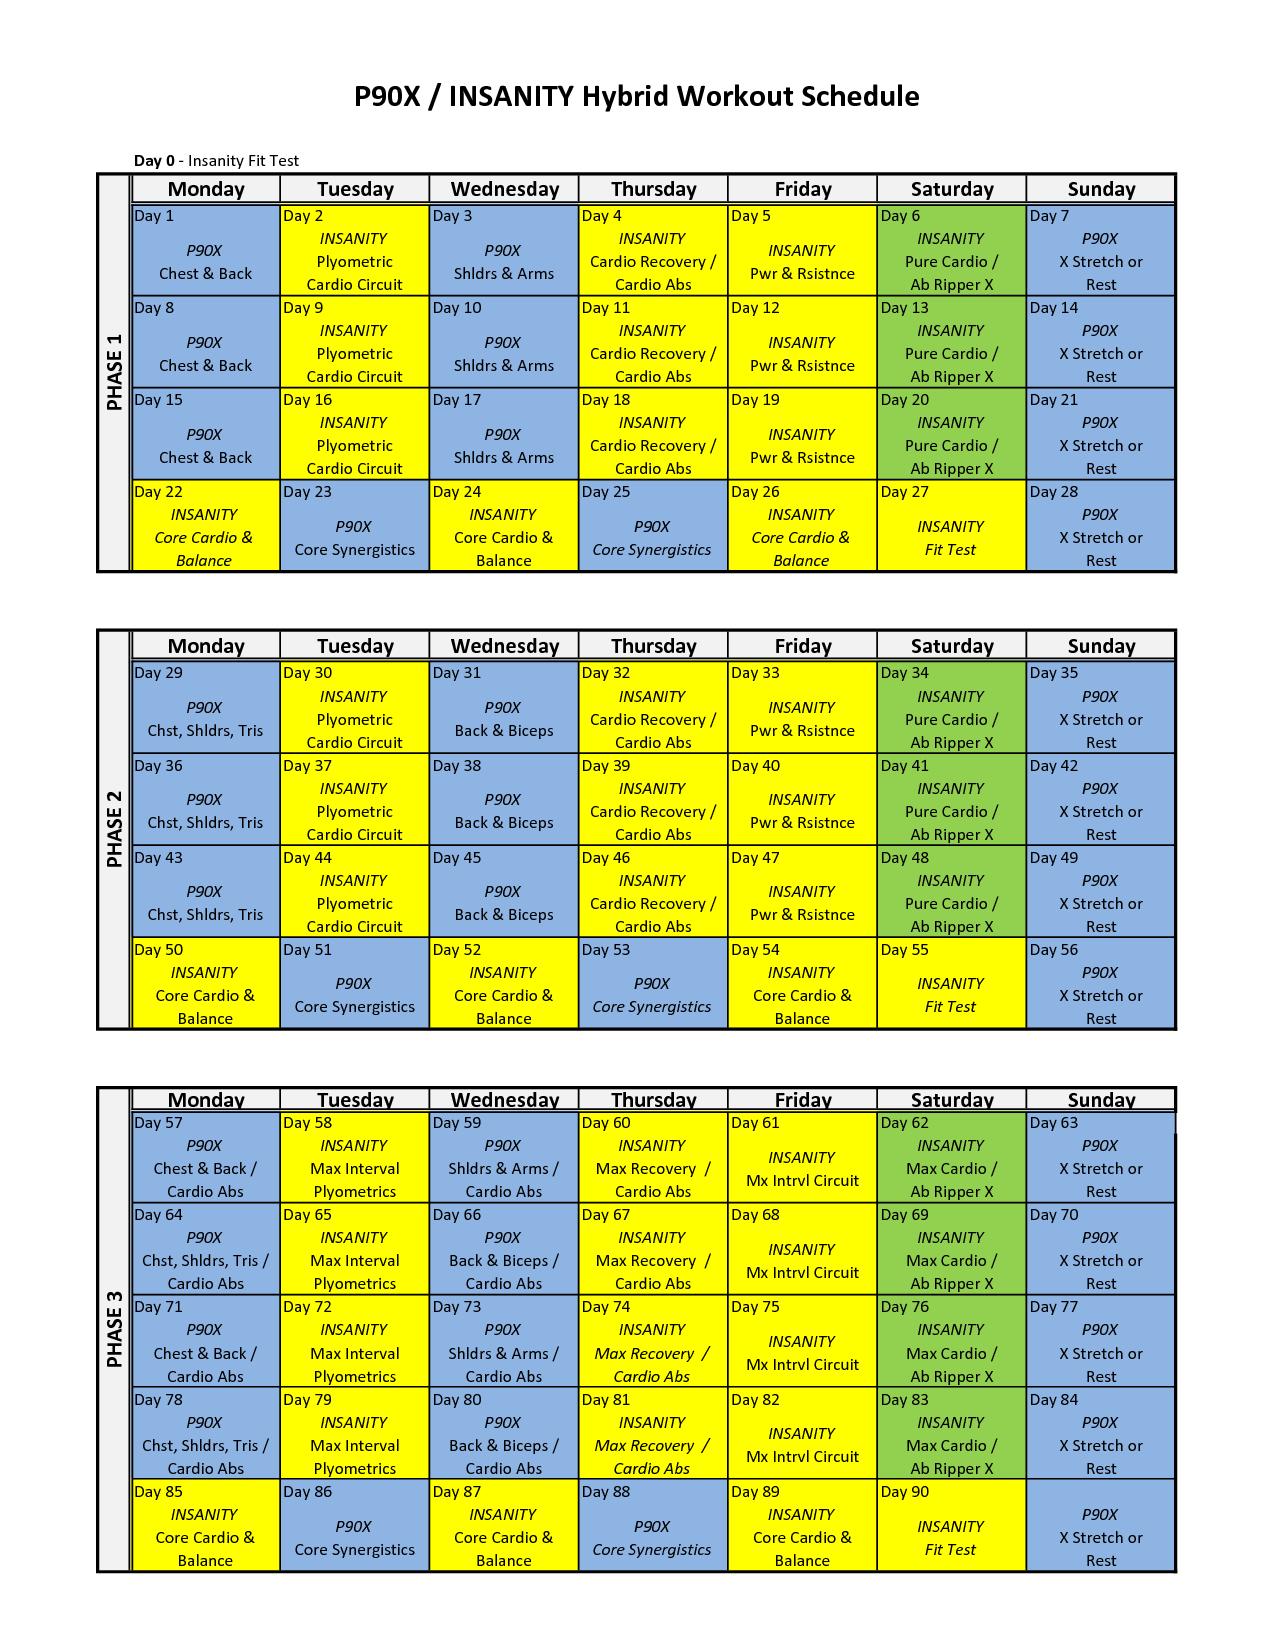 P90x Insanity Hybrid Workout Sheets Printable